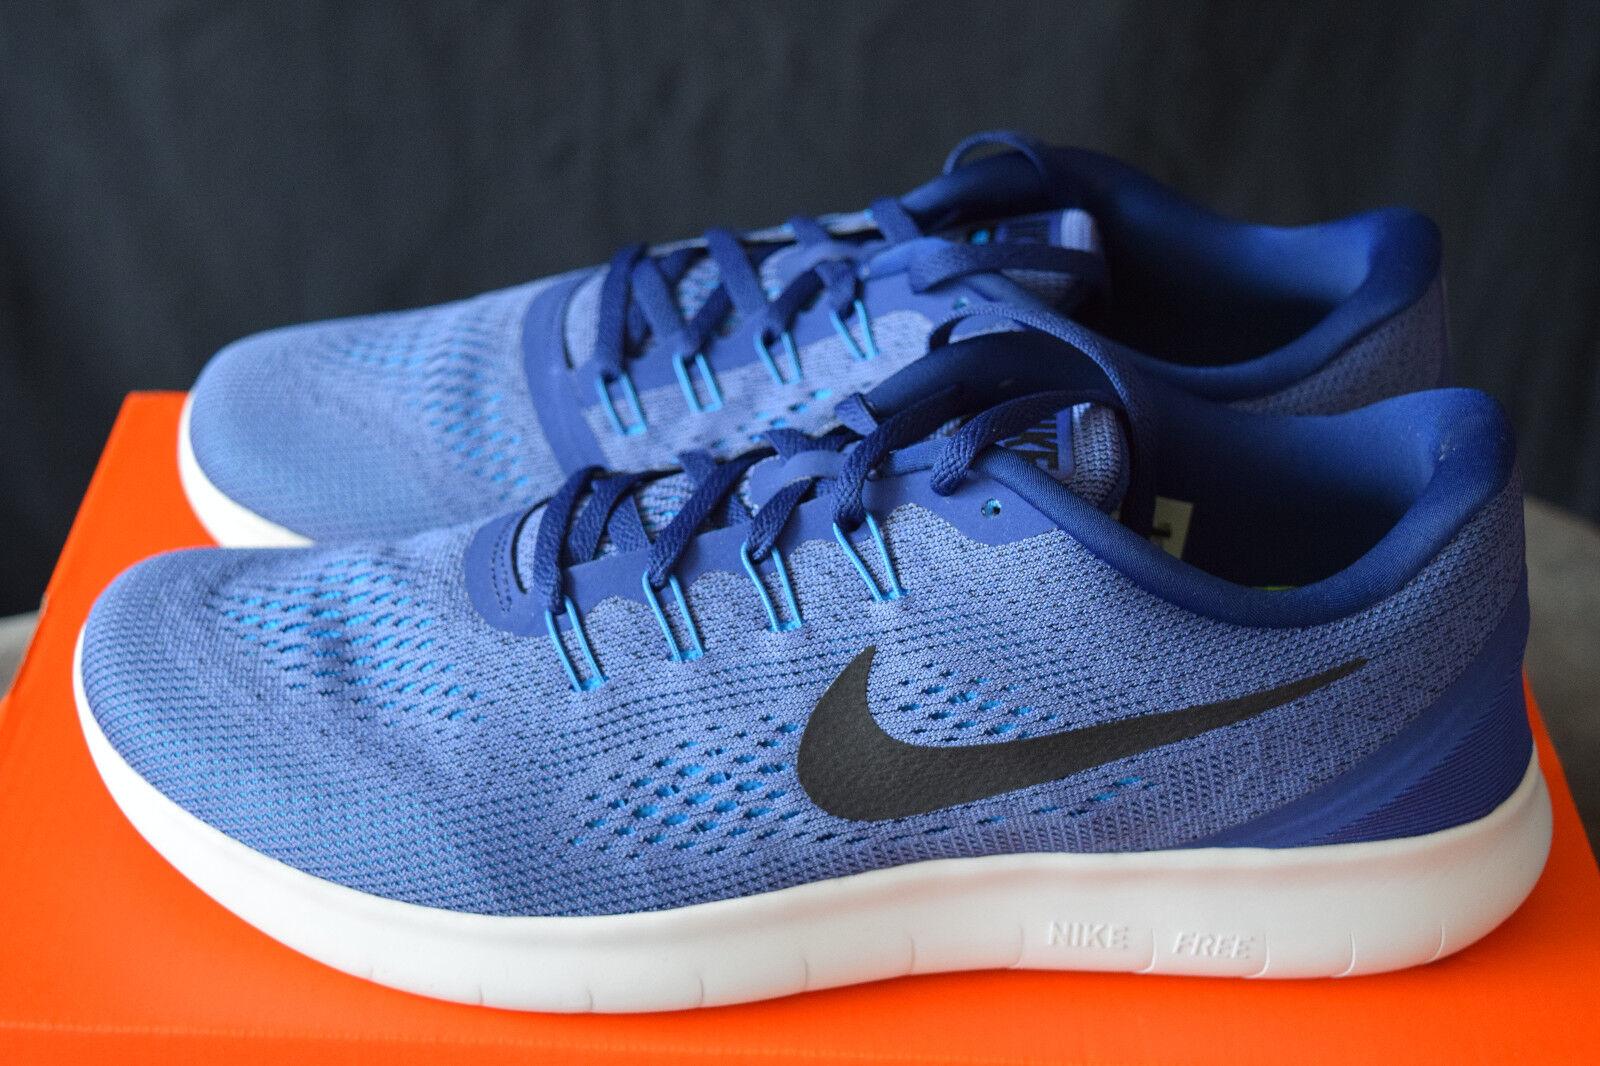 New Nike Free RN Mens Premium Running Shoes Sz 12 Purple Dust Black White